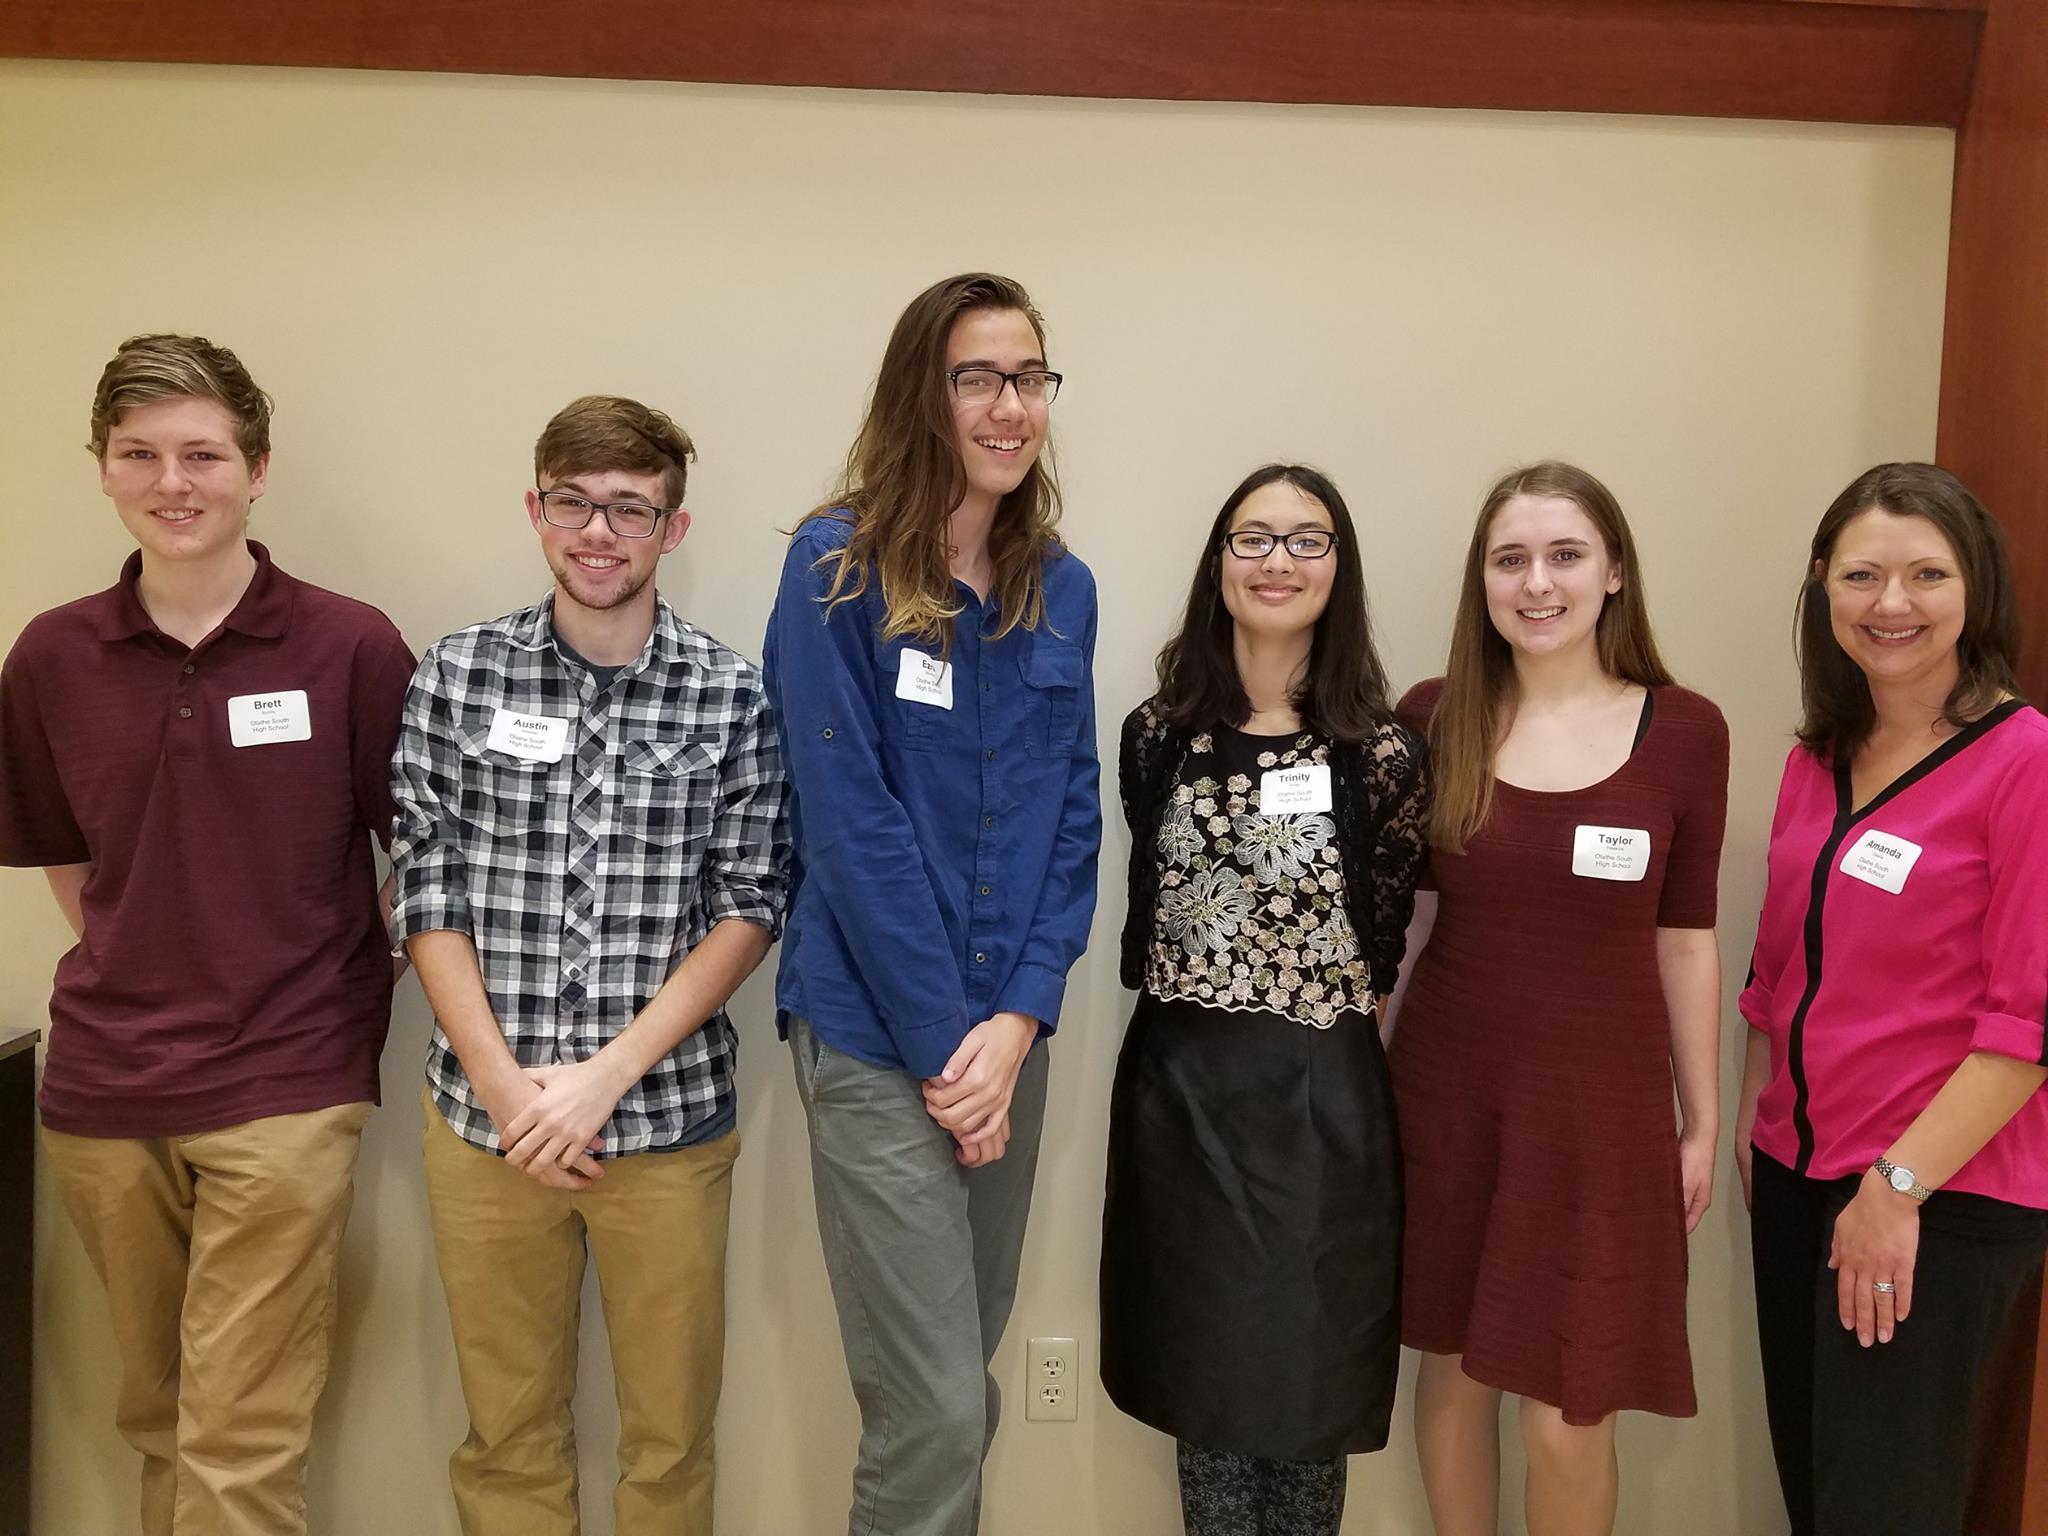 Olathe South High School Brett Schilly, Austin(James)Schober, Ezra Stanley, Trinity Wong, Taylor Hawkins, TEACHER - Amanda Doane